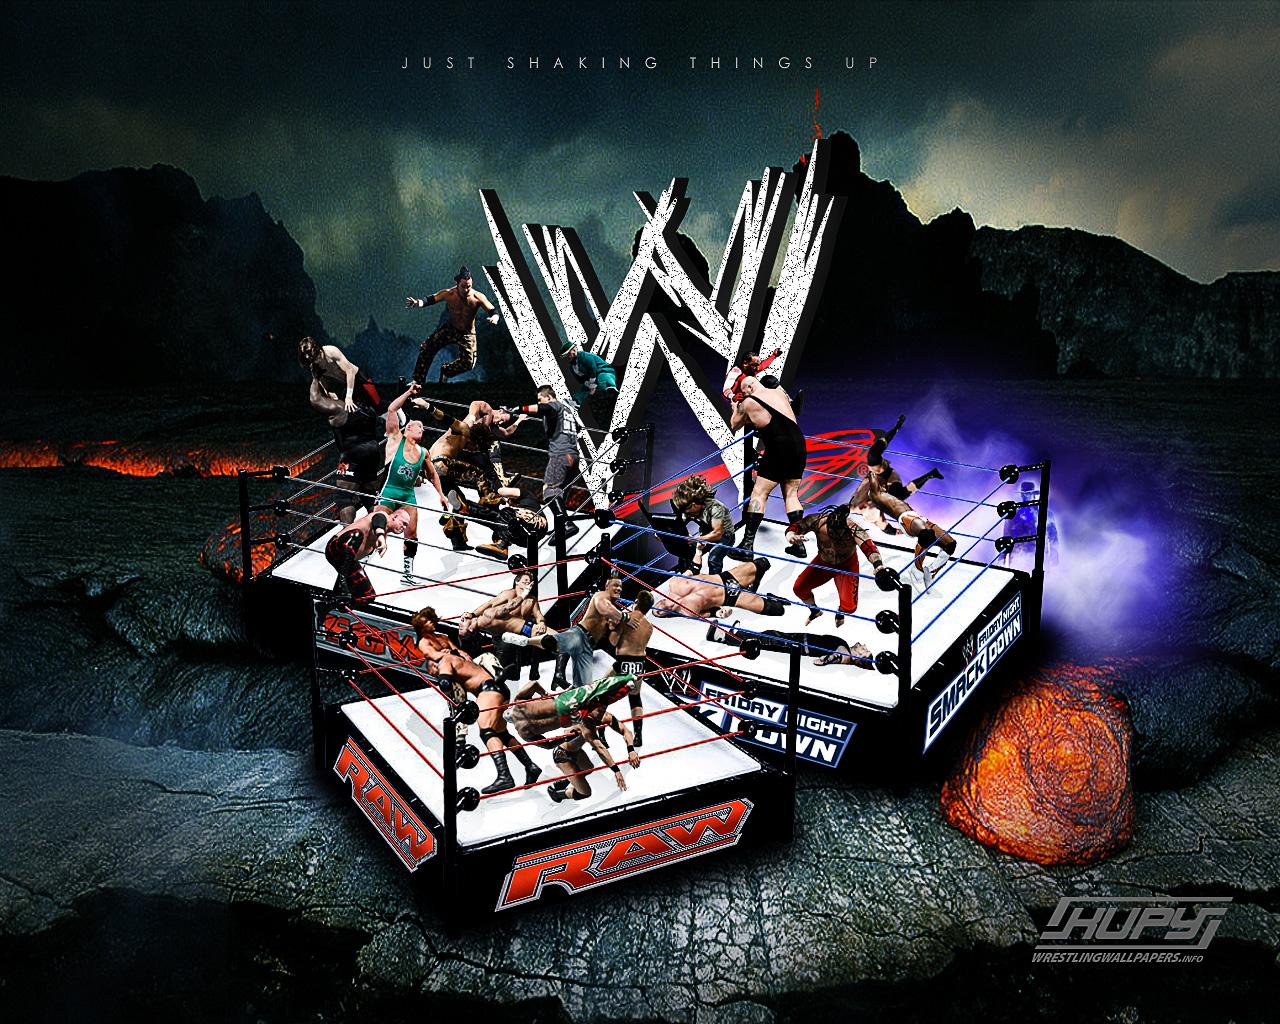 http://4.bp.blogspot.com/-HM5WKJaQdPY/UNM5ov96raI/AAAAAAAAEAM/0vkxWknwbGM/s1600/WWE-Wallpapers-10.jpg